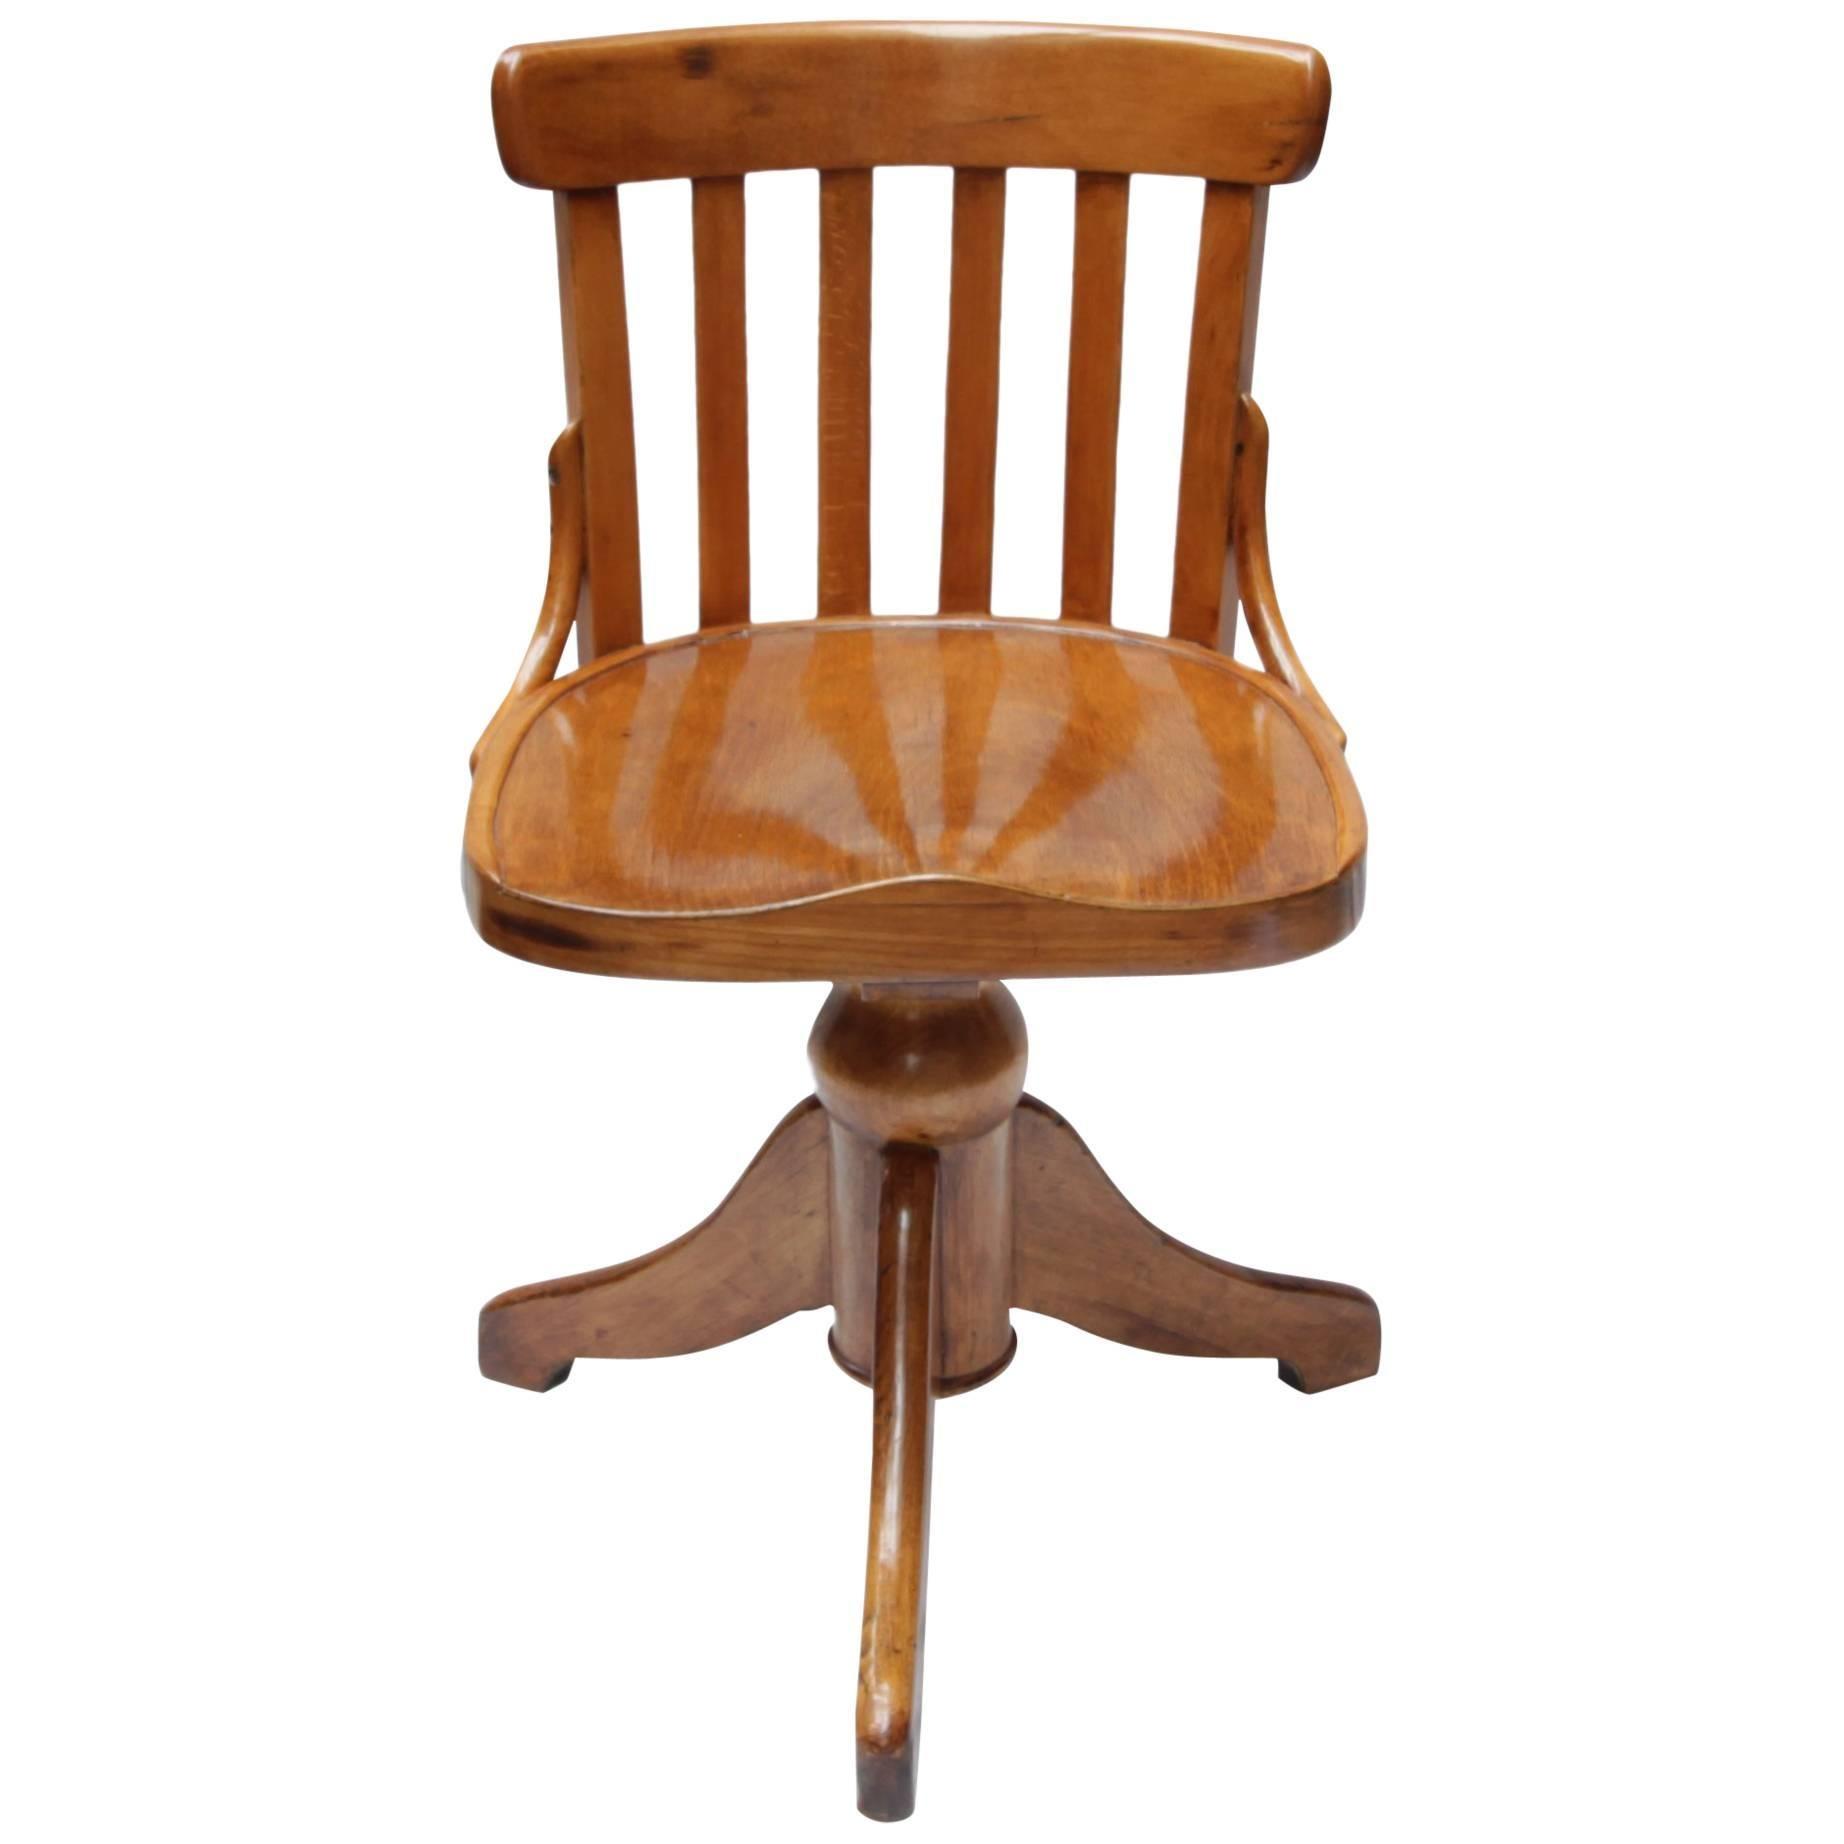 Art Nouveau Soild Beechwood Chair to Turn for Height Adjustable